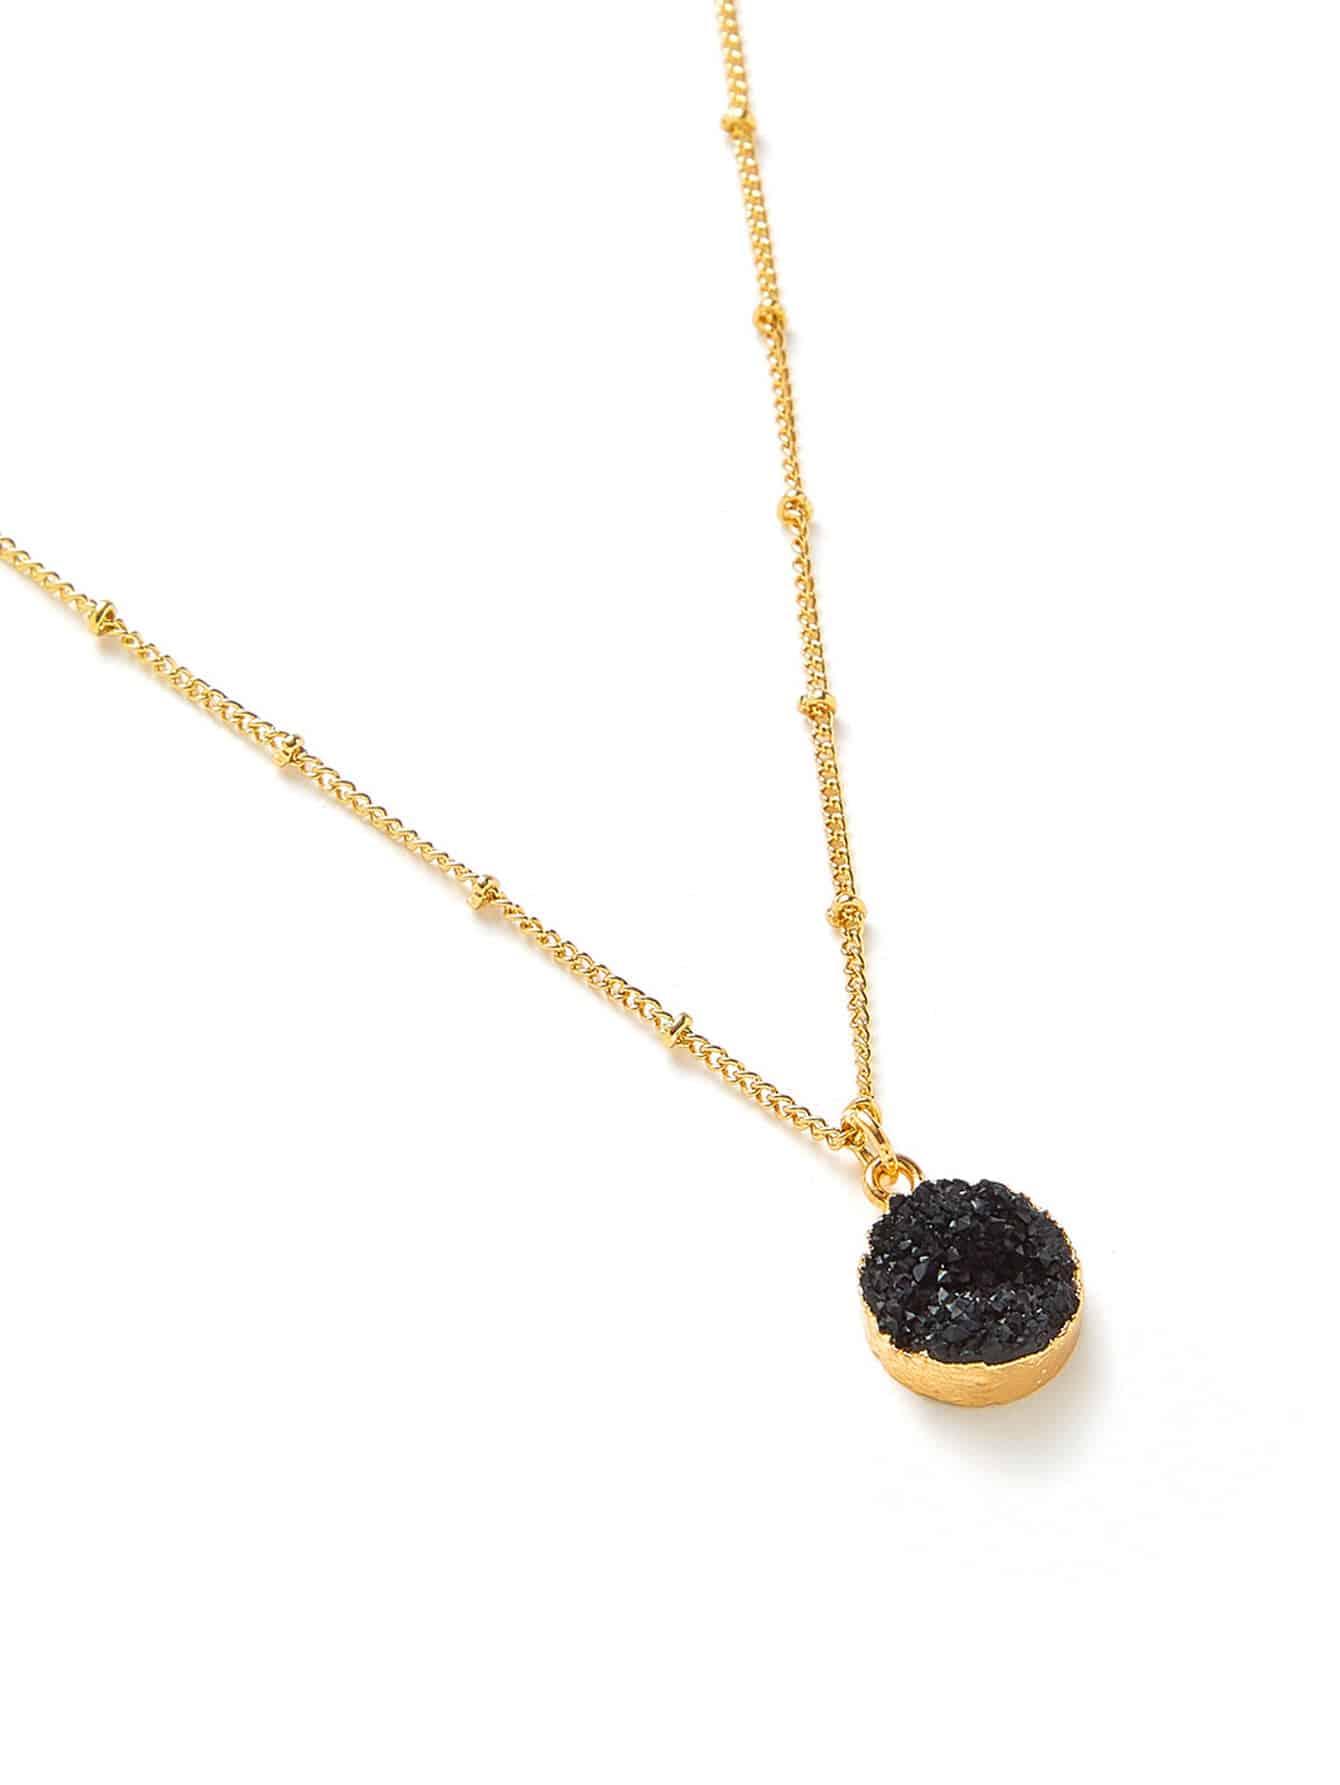 Round Pendant Chain Necklace